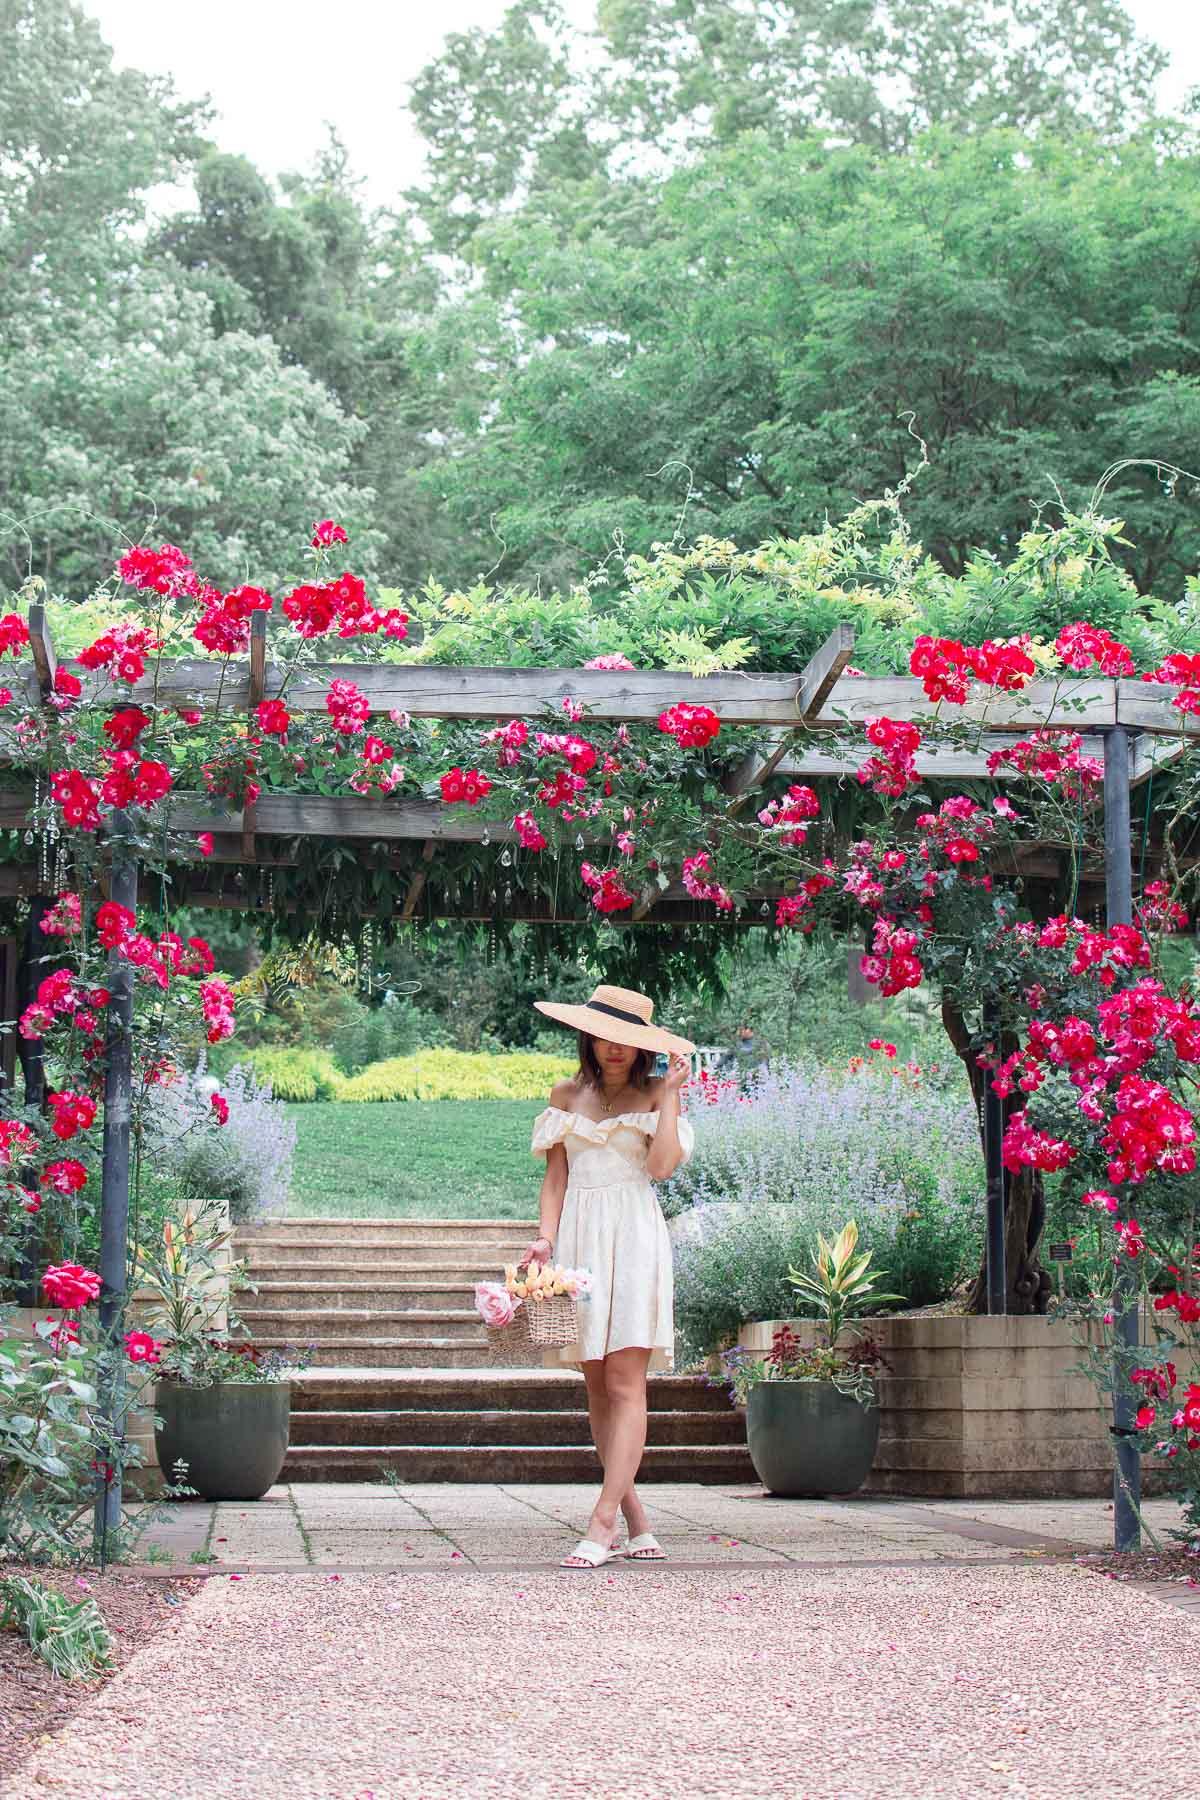 brookside gardens roses